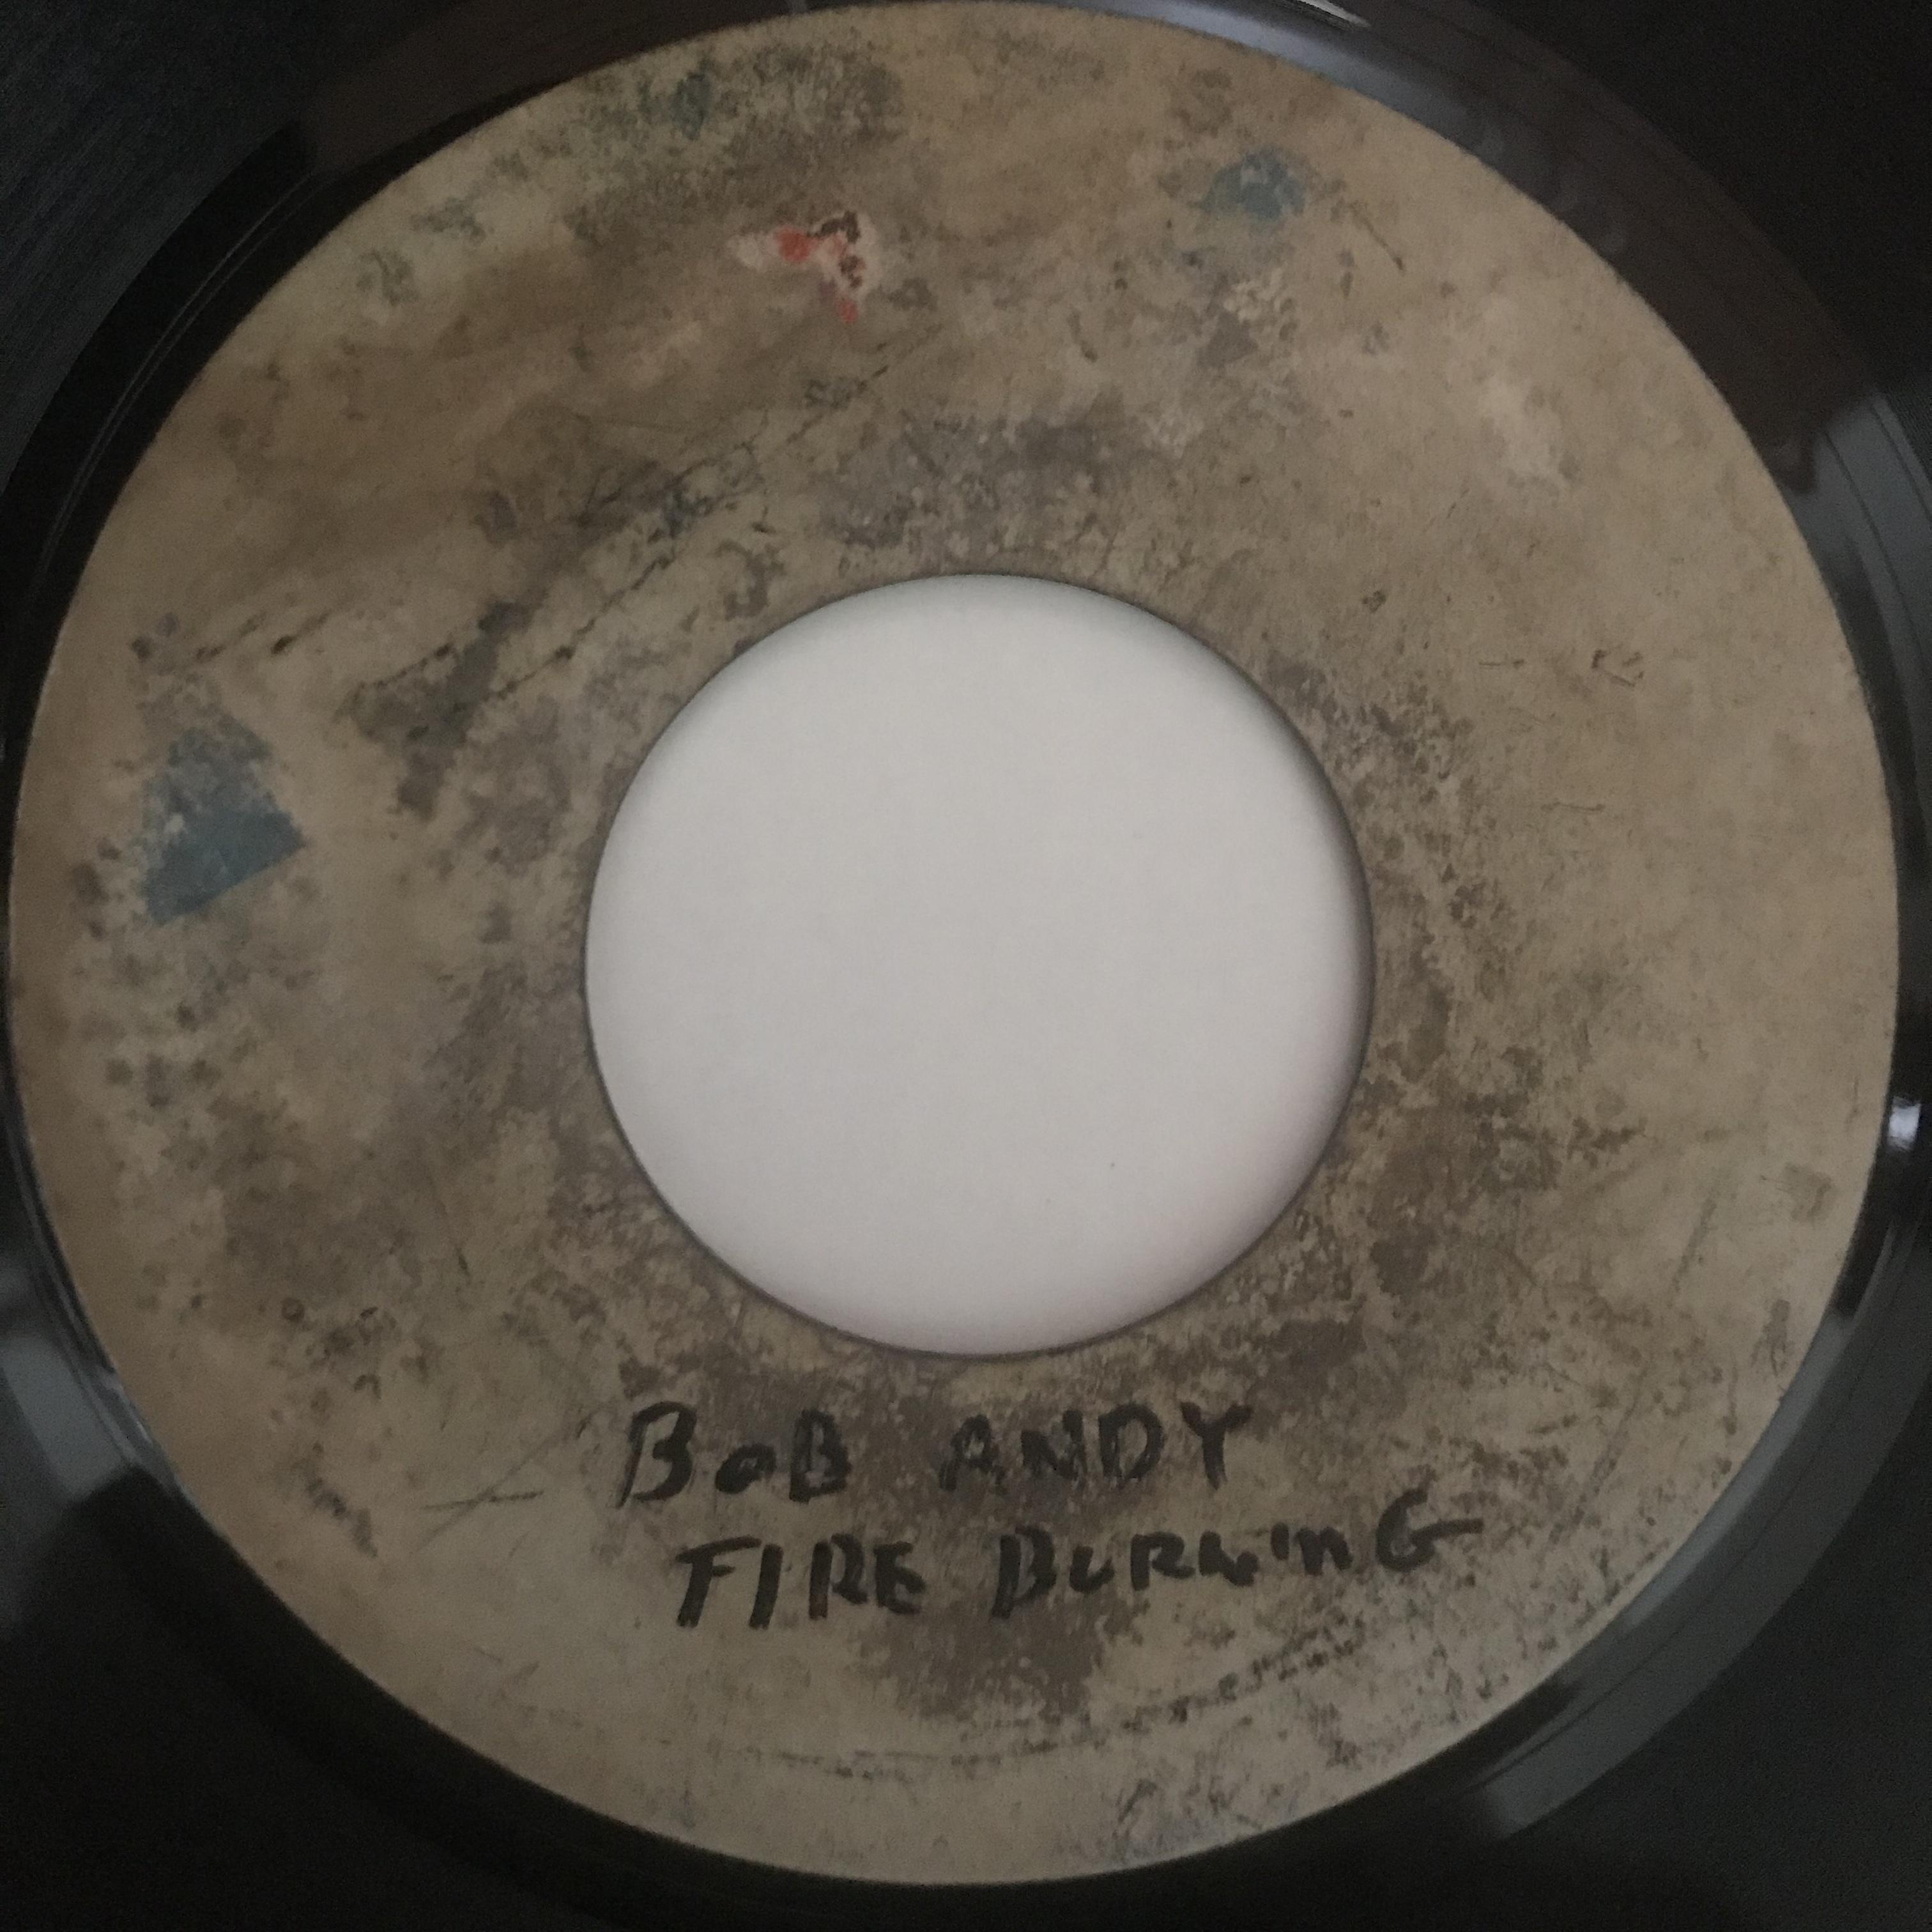 Bob Andy - Fire Burning【7-10906】